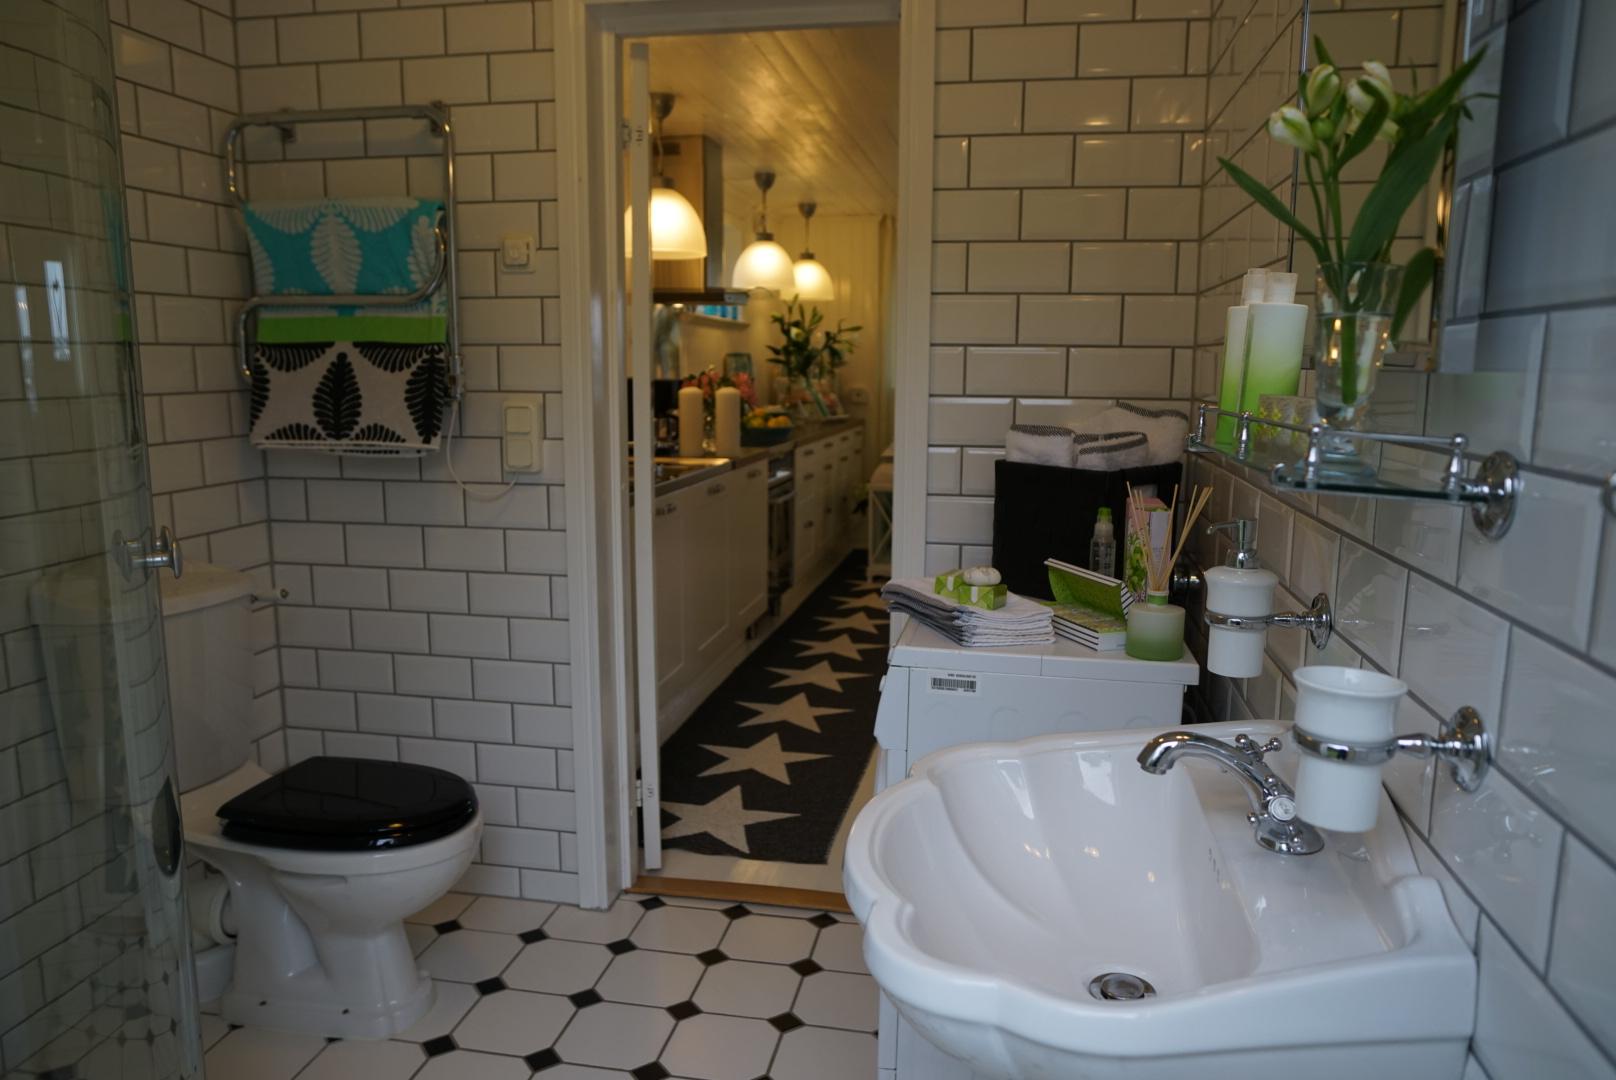 badrum ut mot kök